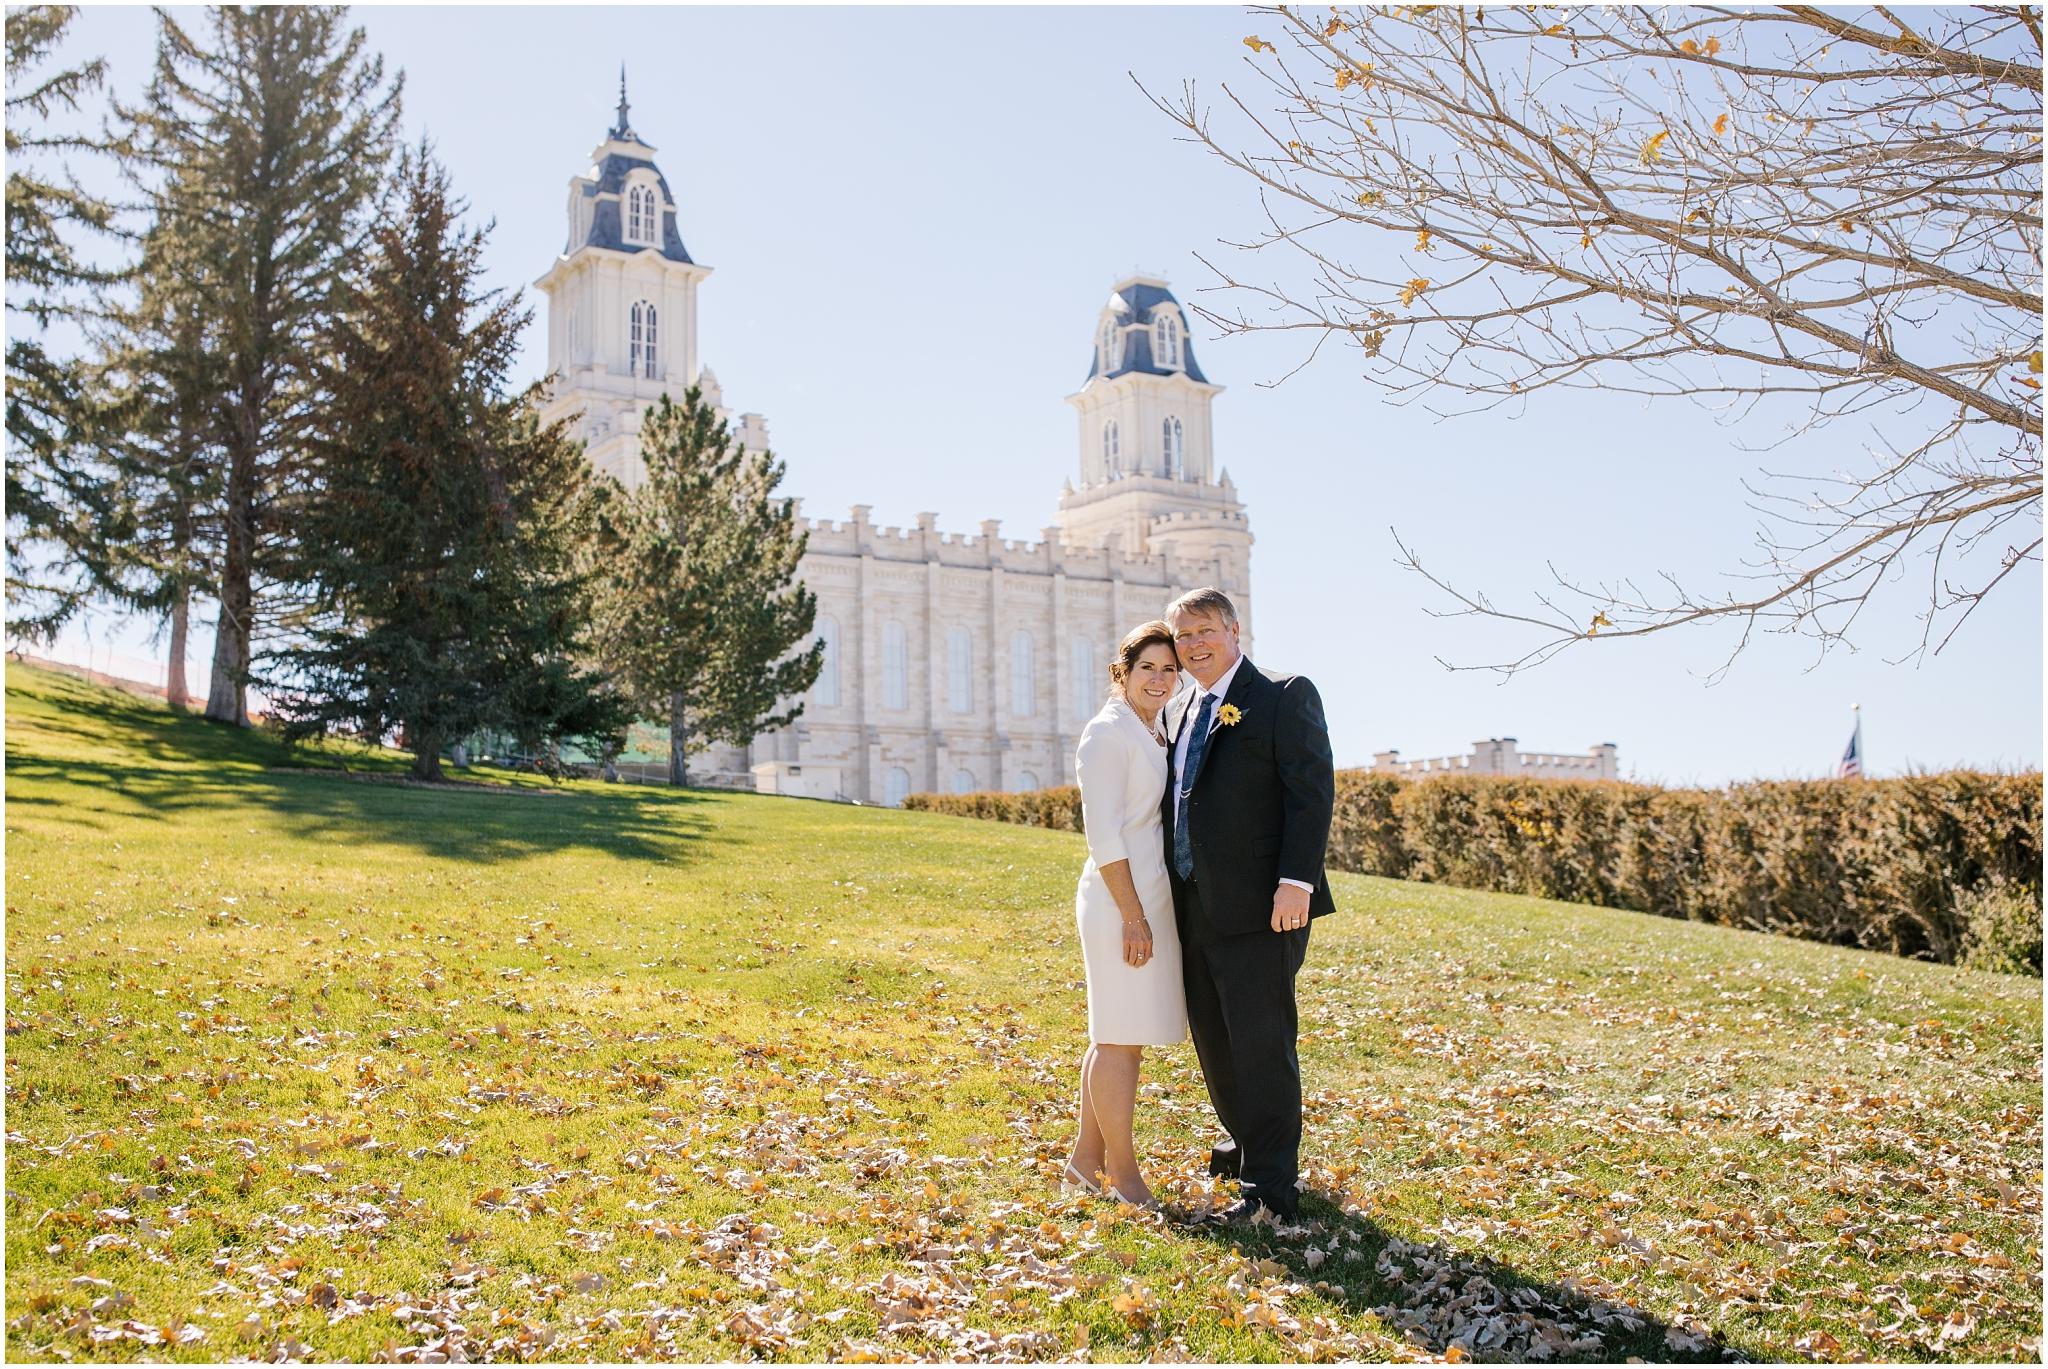 PDWeddingDay-147_Lizzie-B-Imagery-Utah-Wedding-Photographer-Salt-Lake-City-Park-City-Utah-County-Manti-Temple.jpg